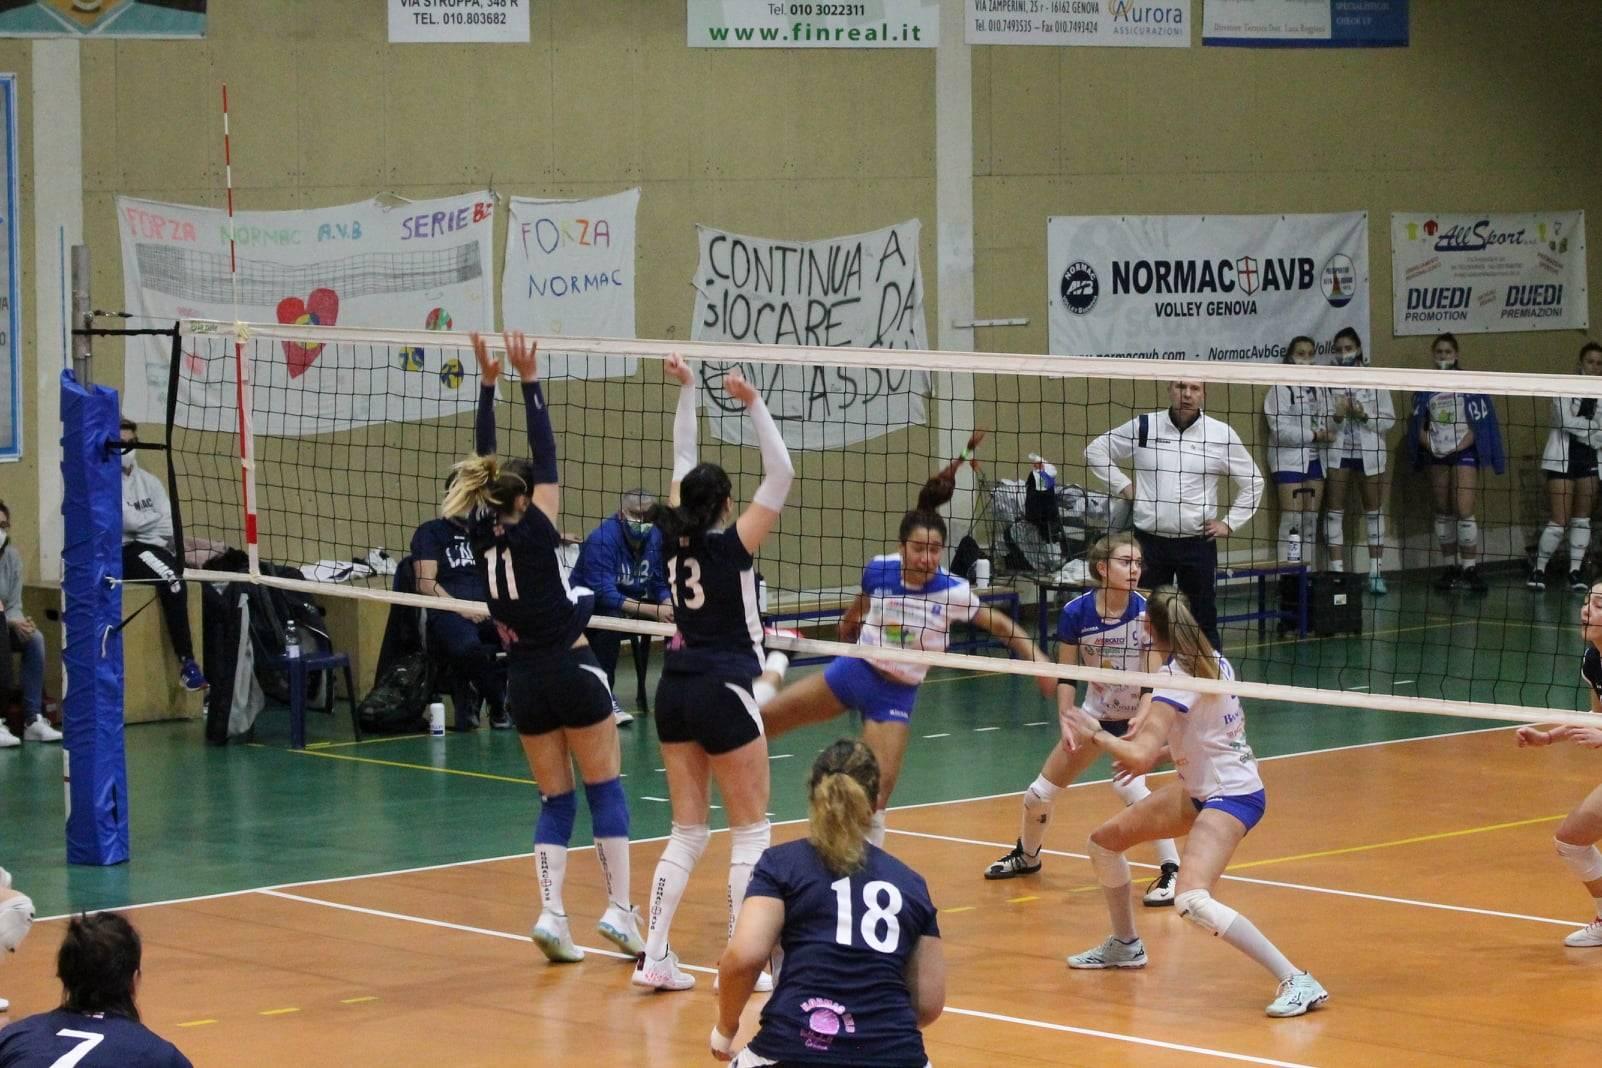 Normac AVB vs L'Alba Volley